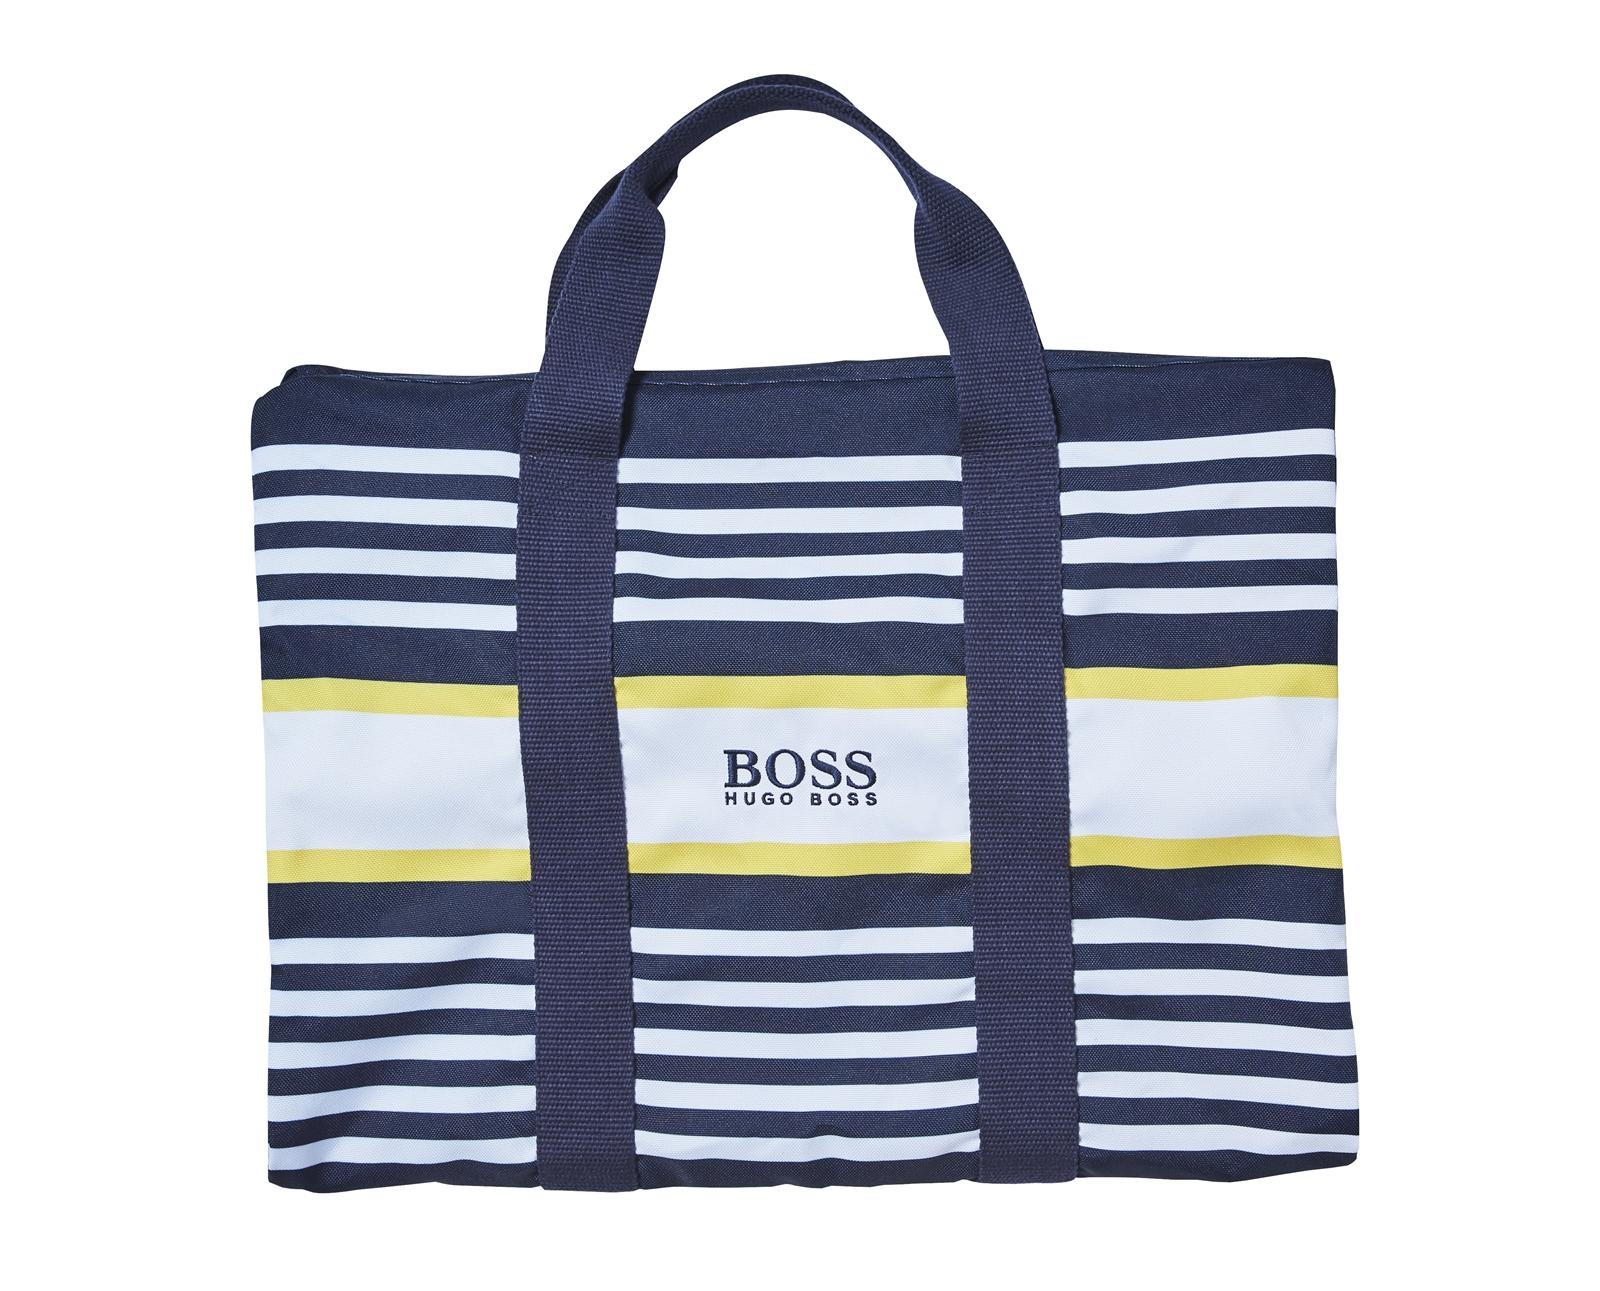 Hugo Boss X Joseph Schooling